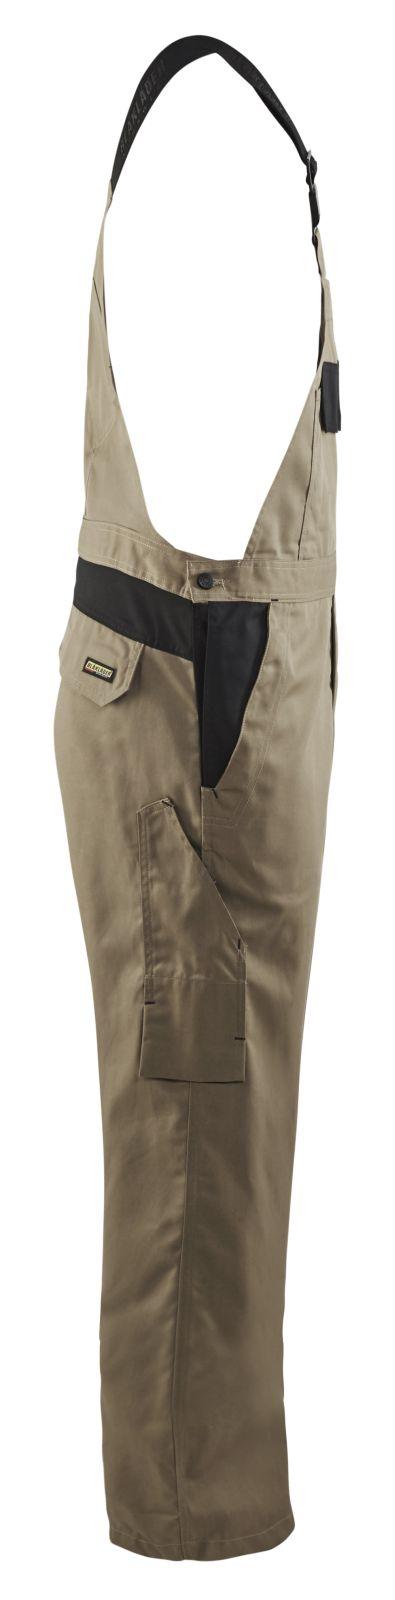 Blaklader Amerikaanse overalls 26641800 khaki-zwart(2499)